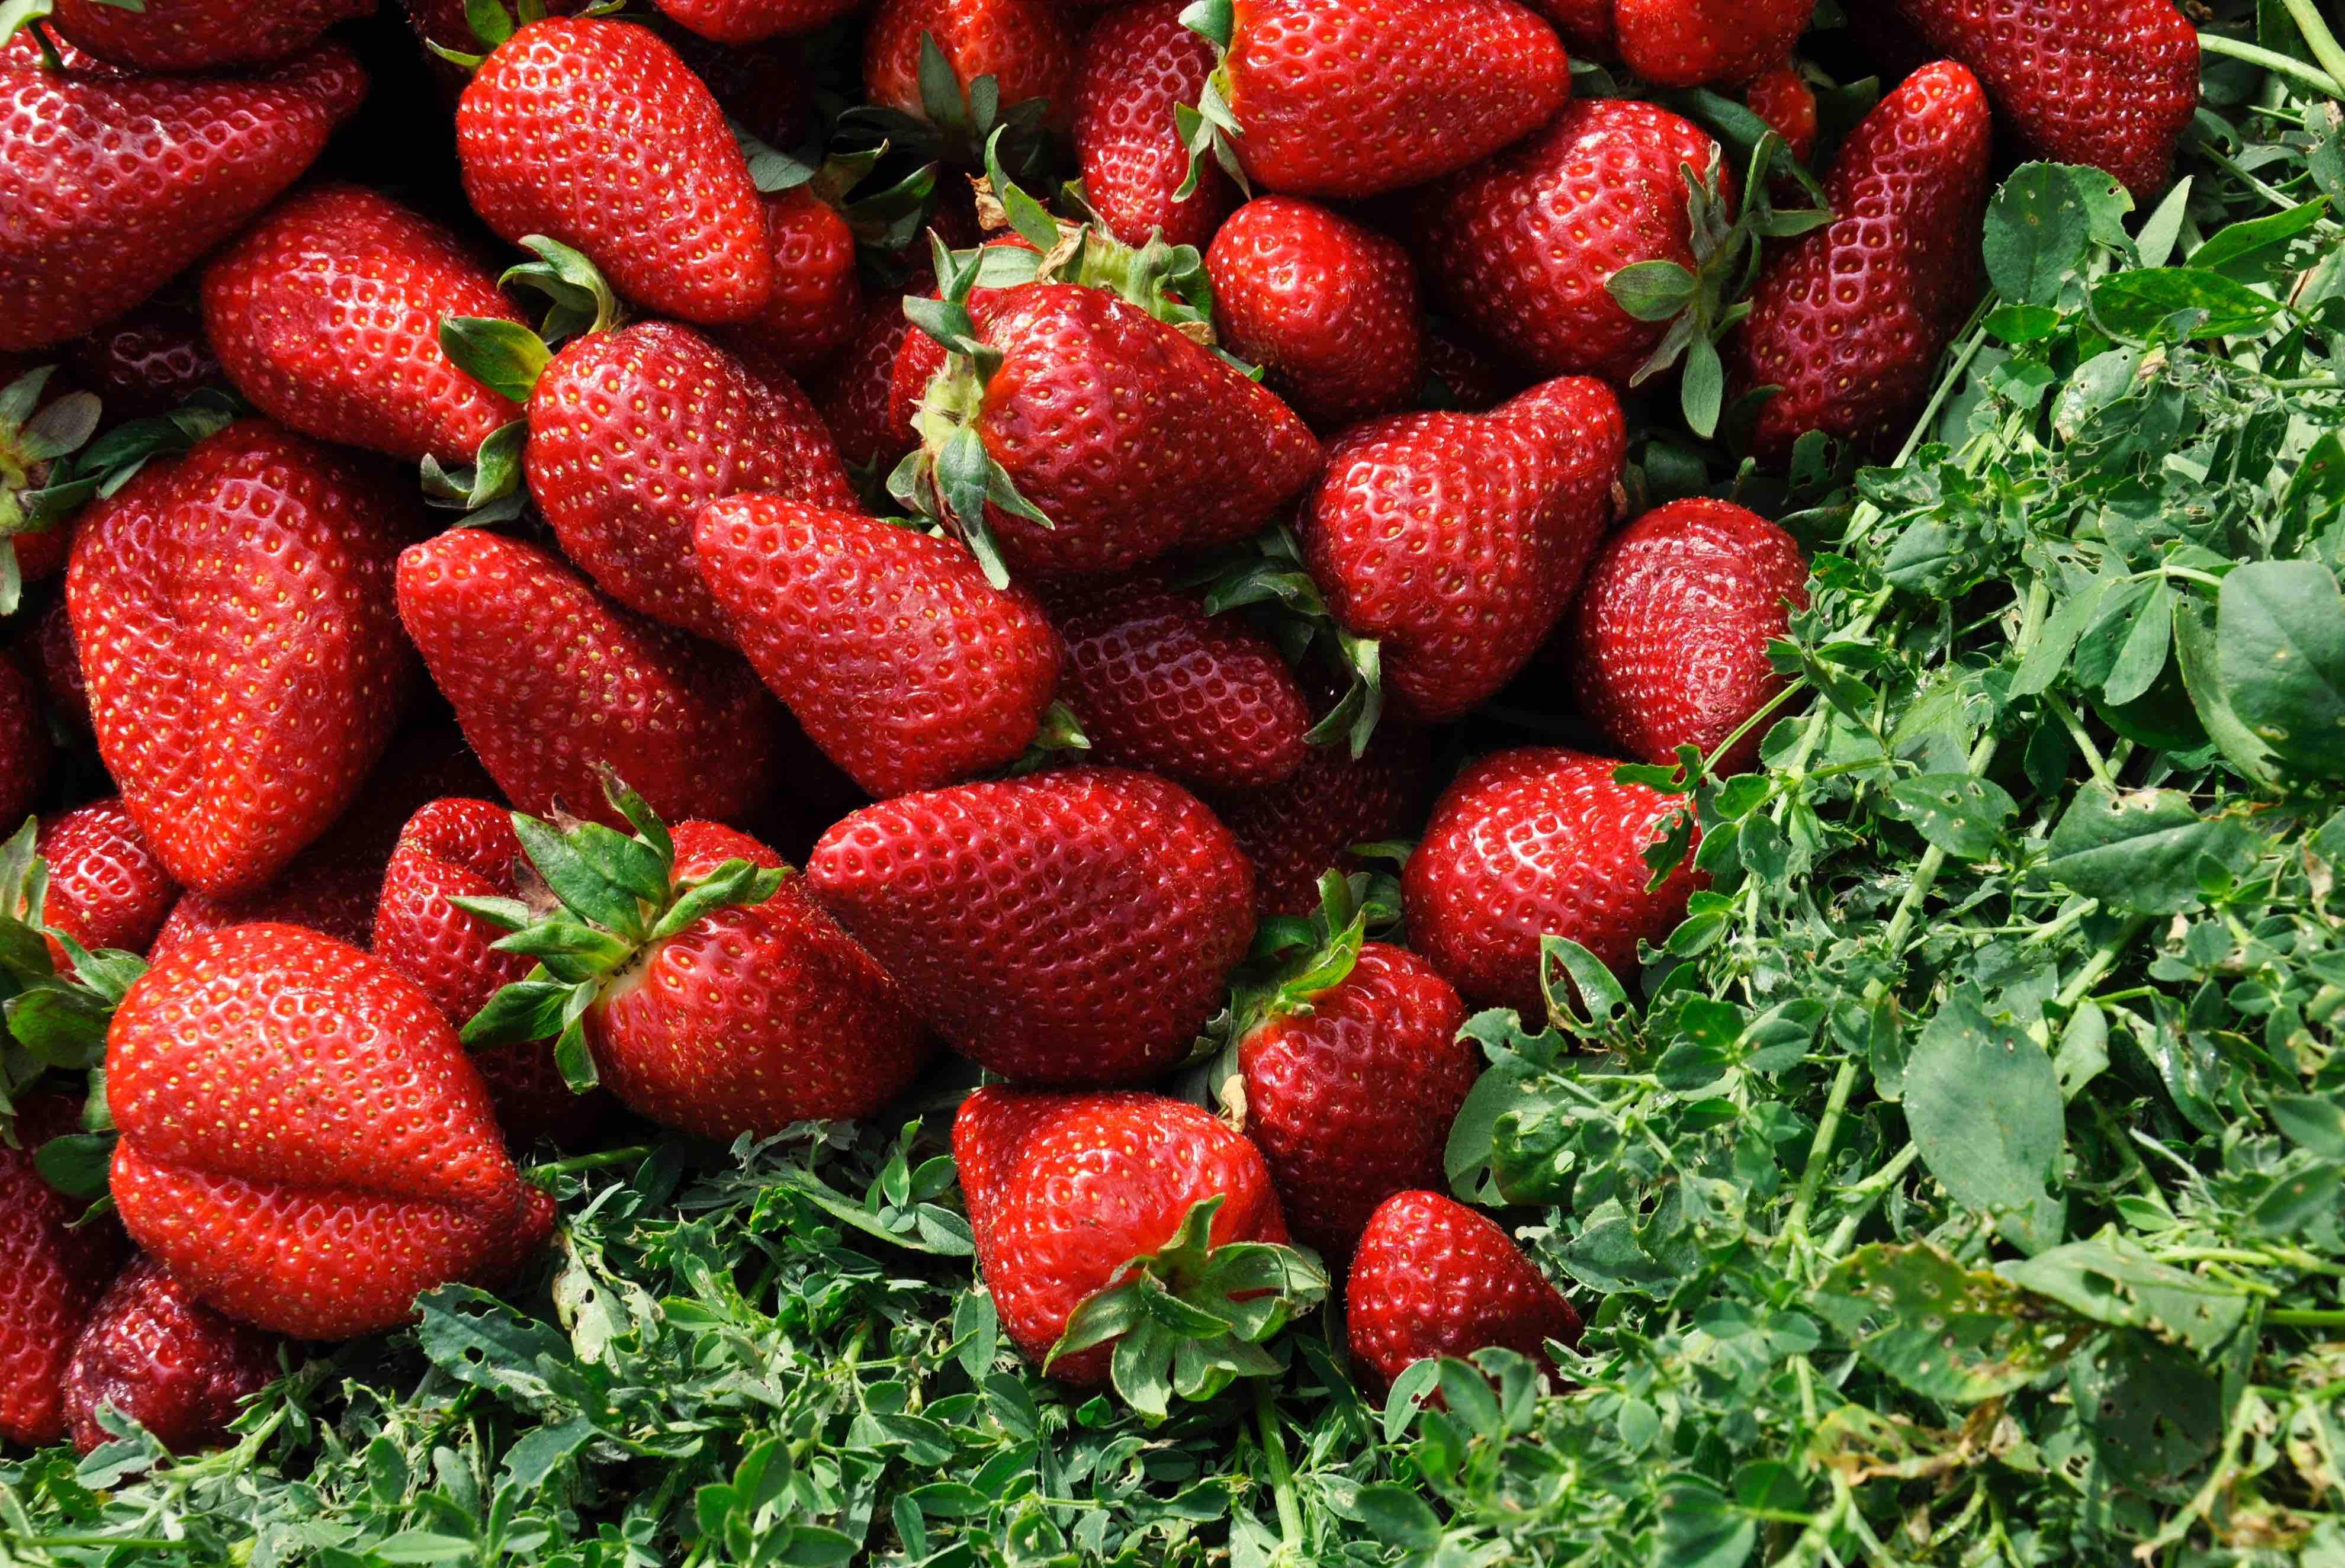 Strawberry Fields Forever?